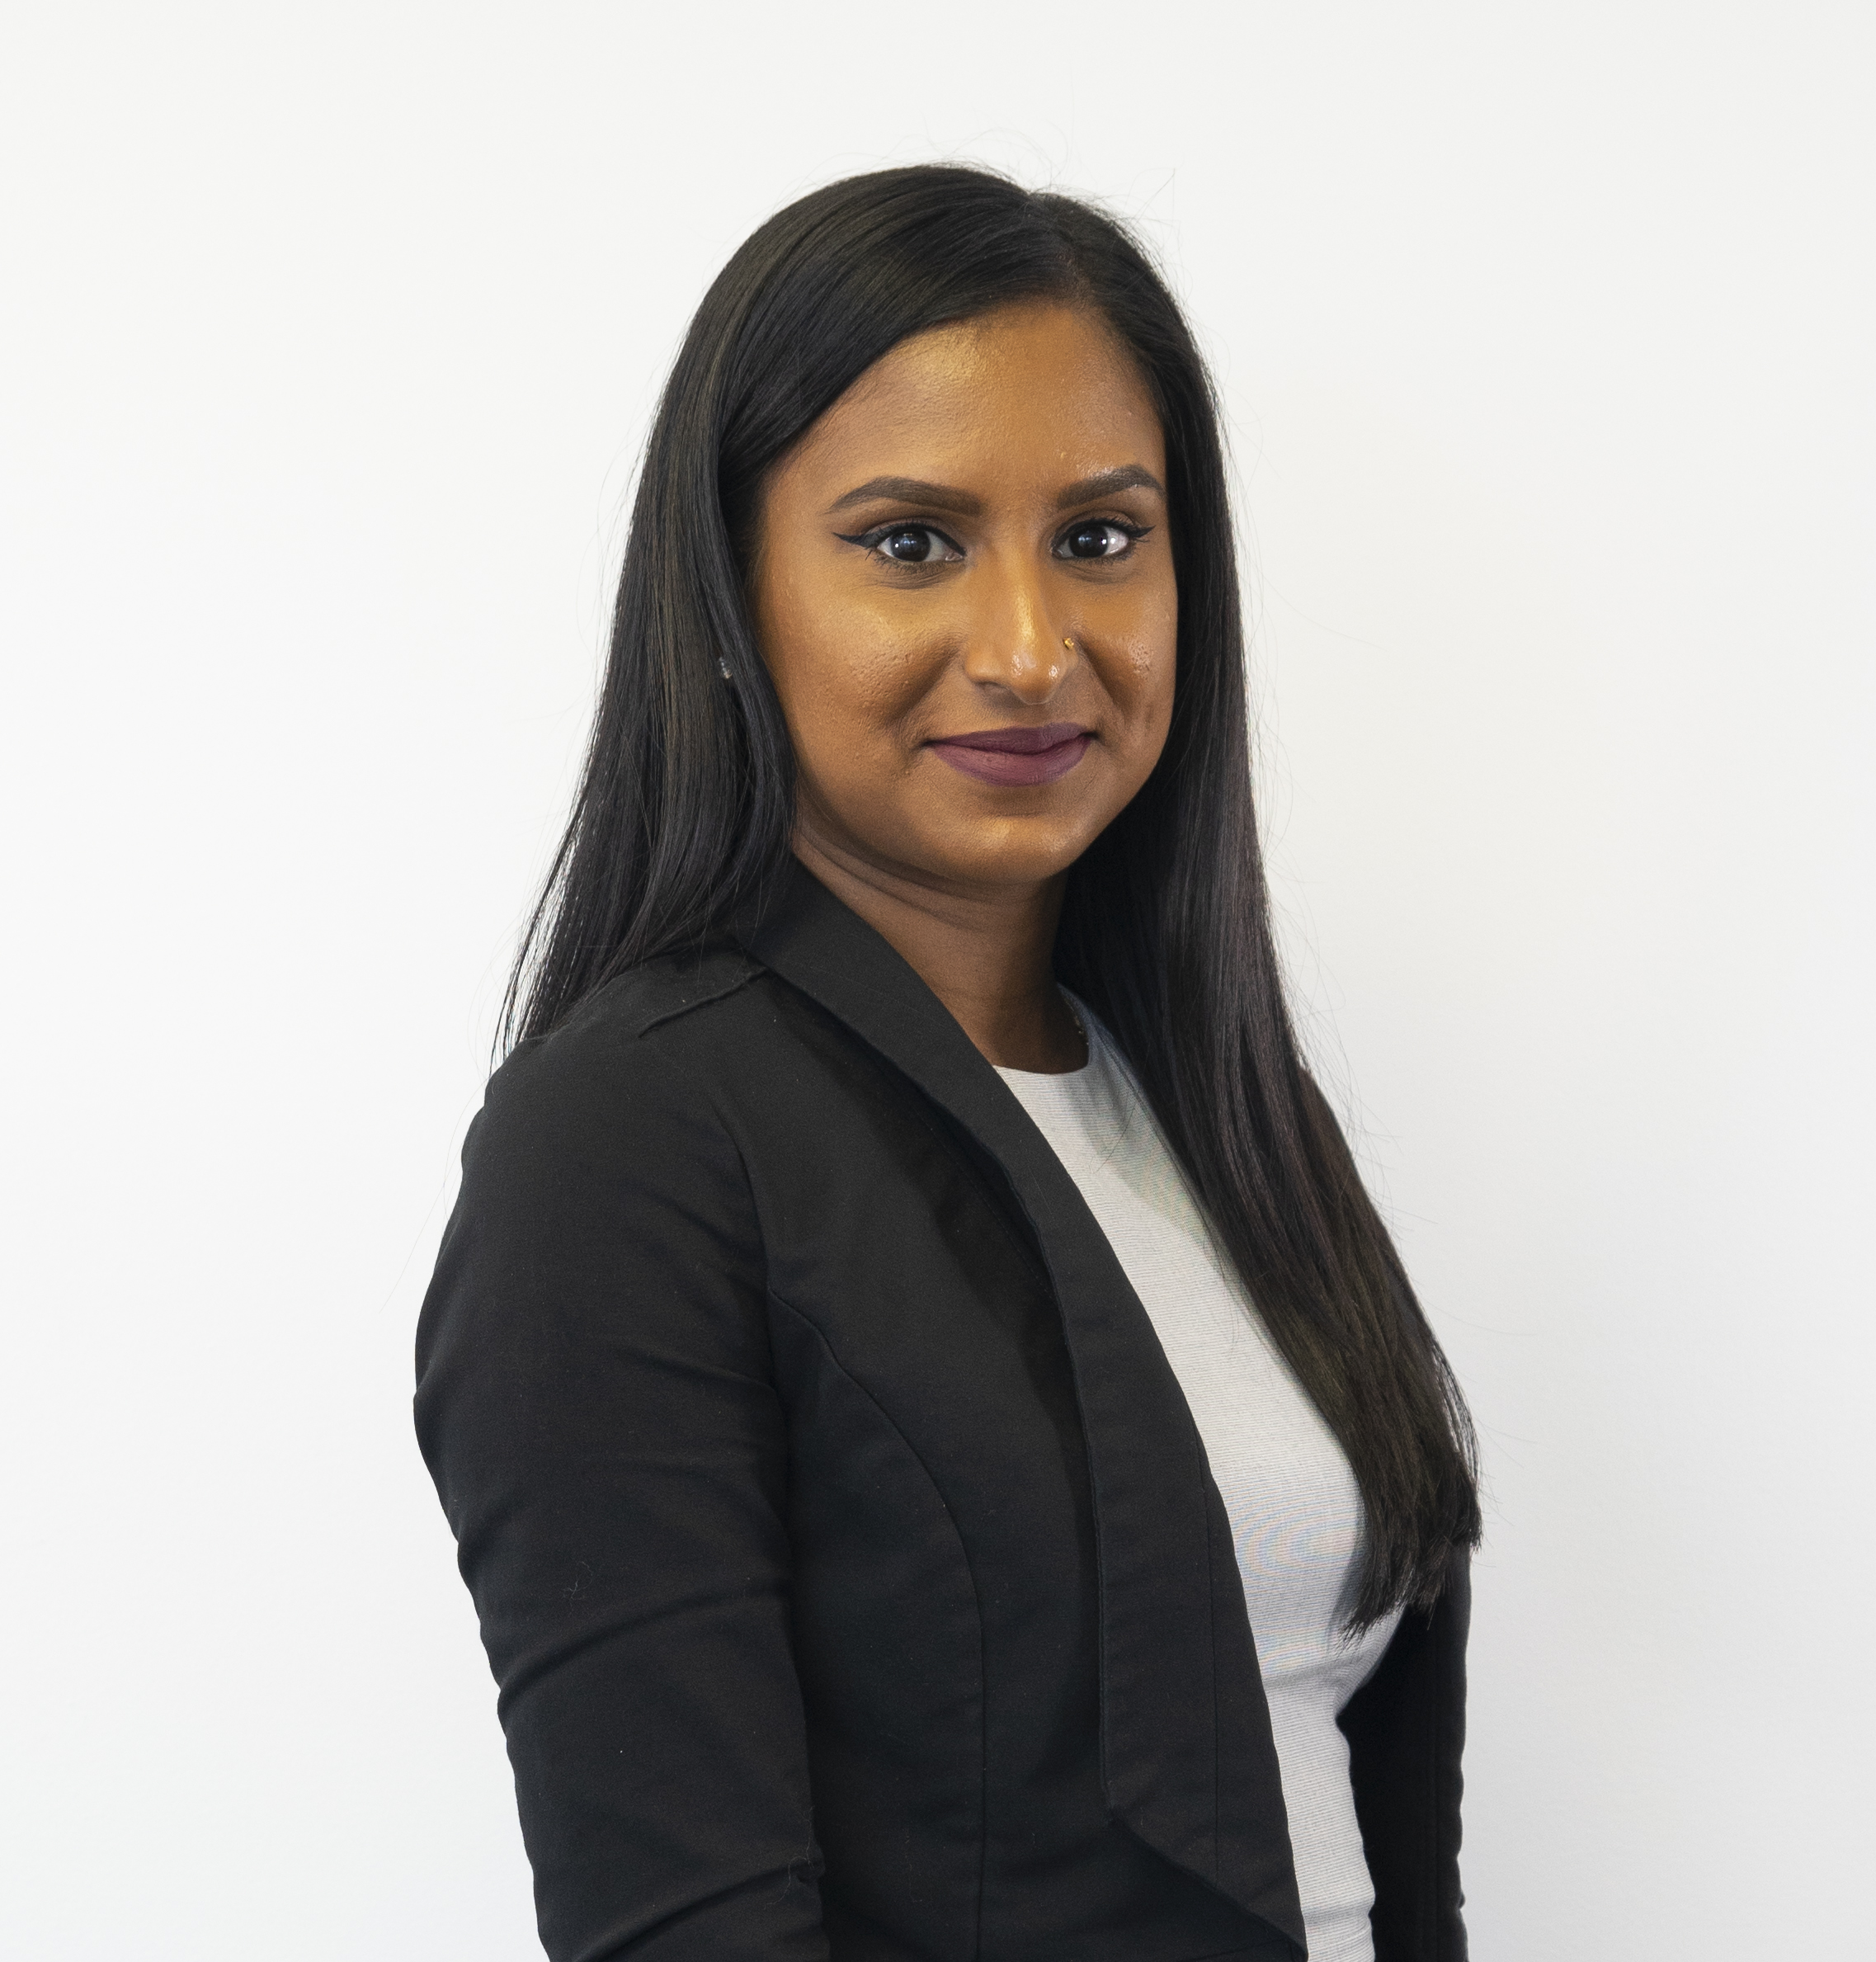 Braveena Vinasithamby